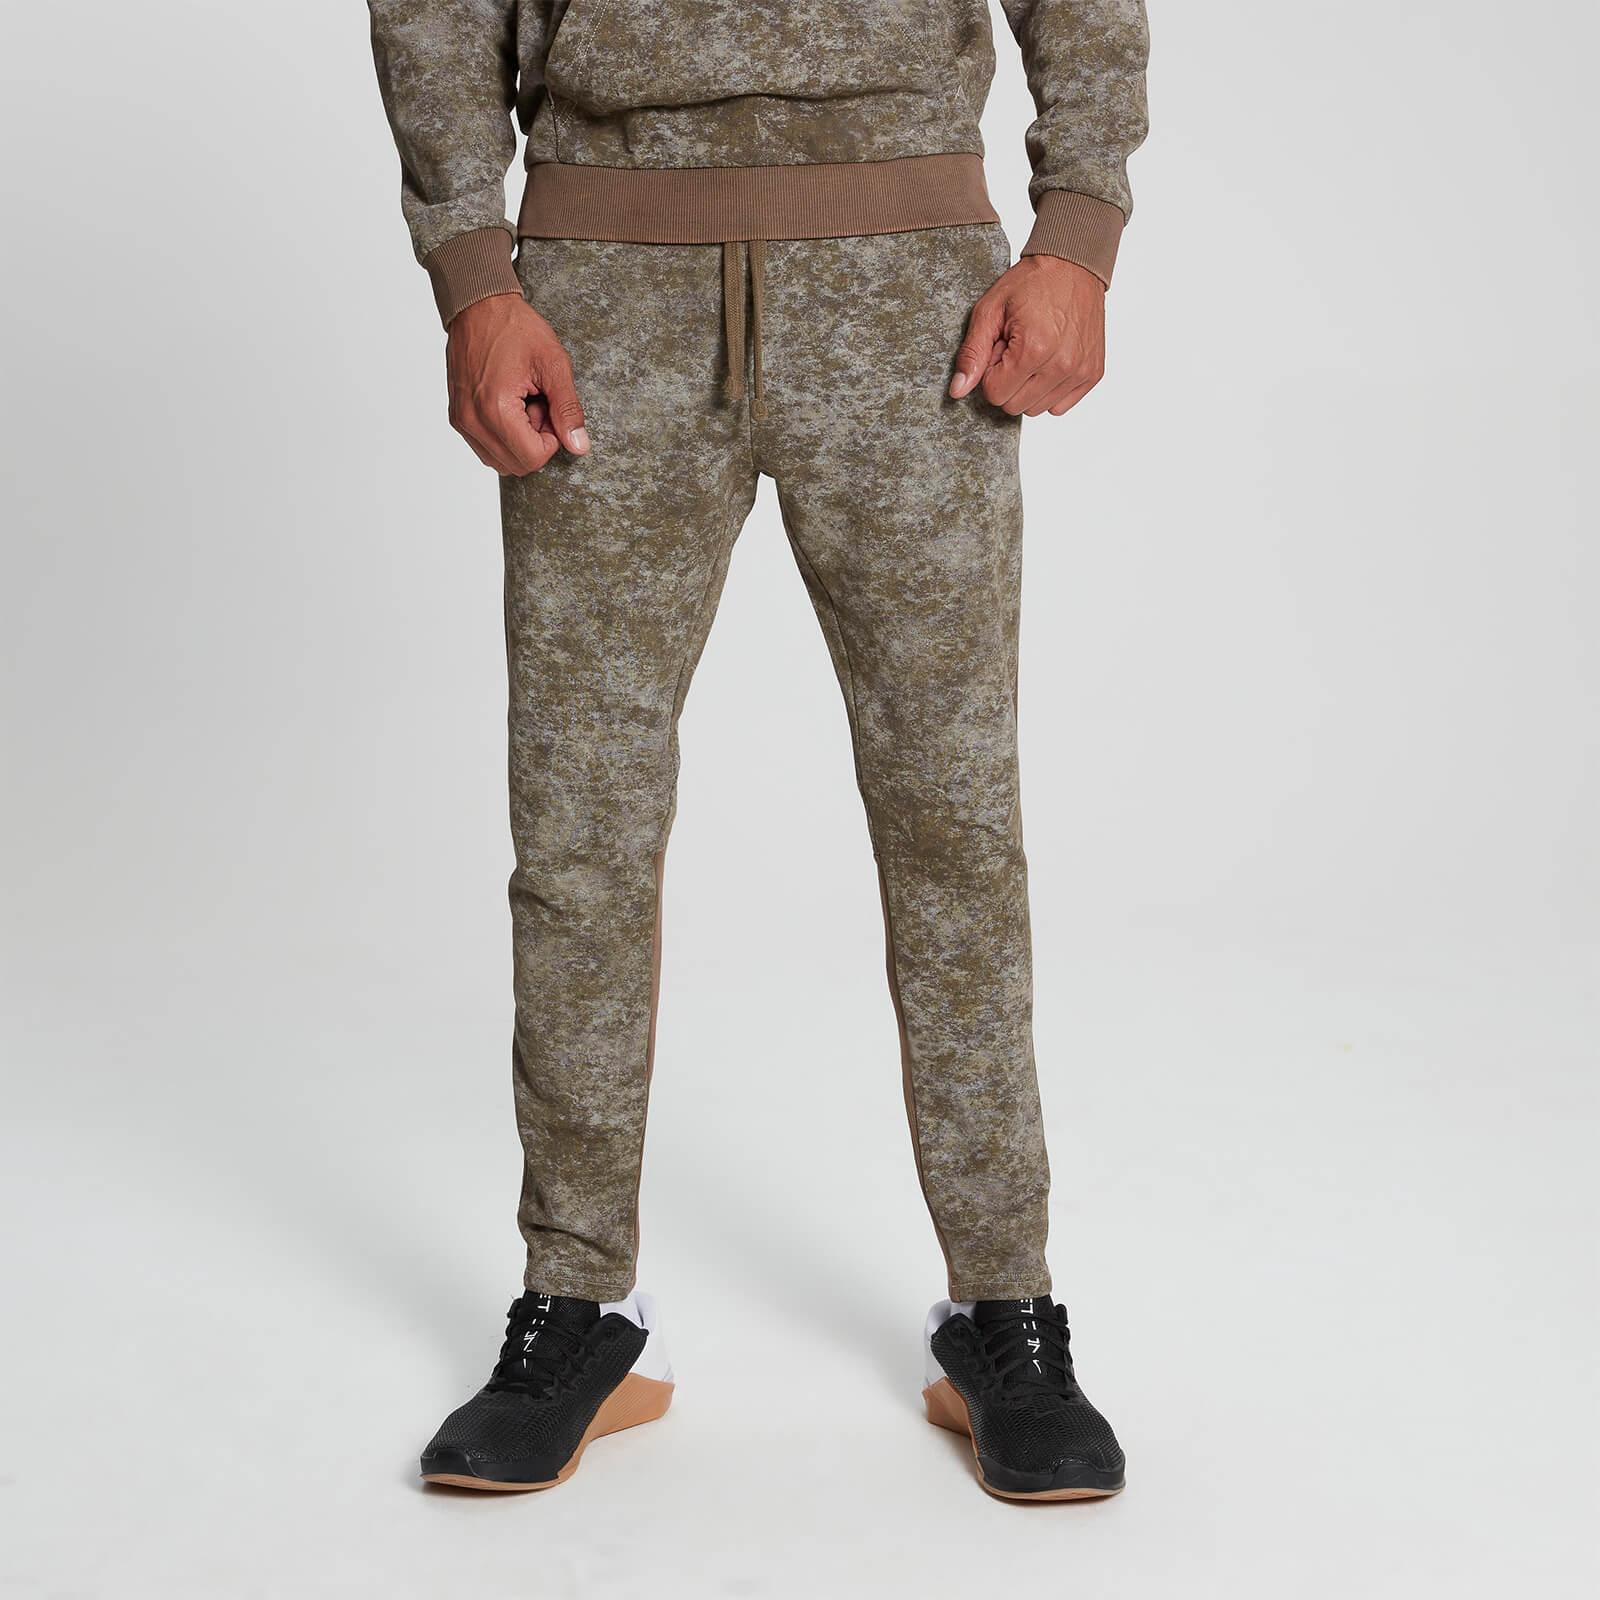 Mp Pantalón deportivo Raw Training para hombre - Camuflaje - XS